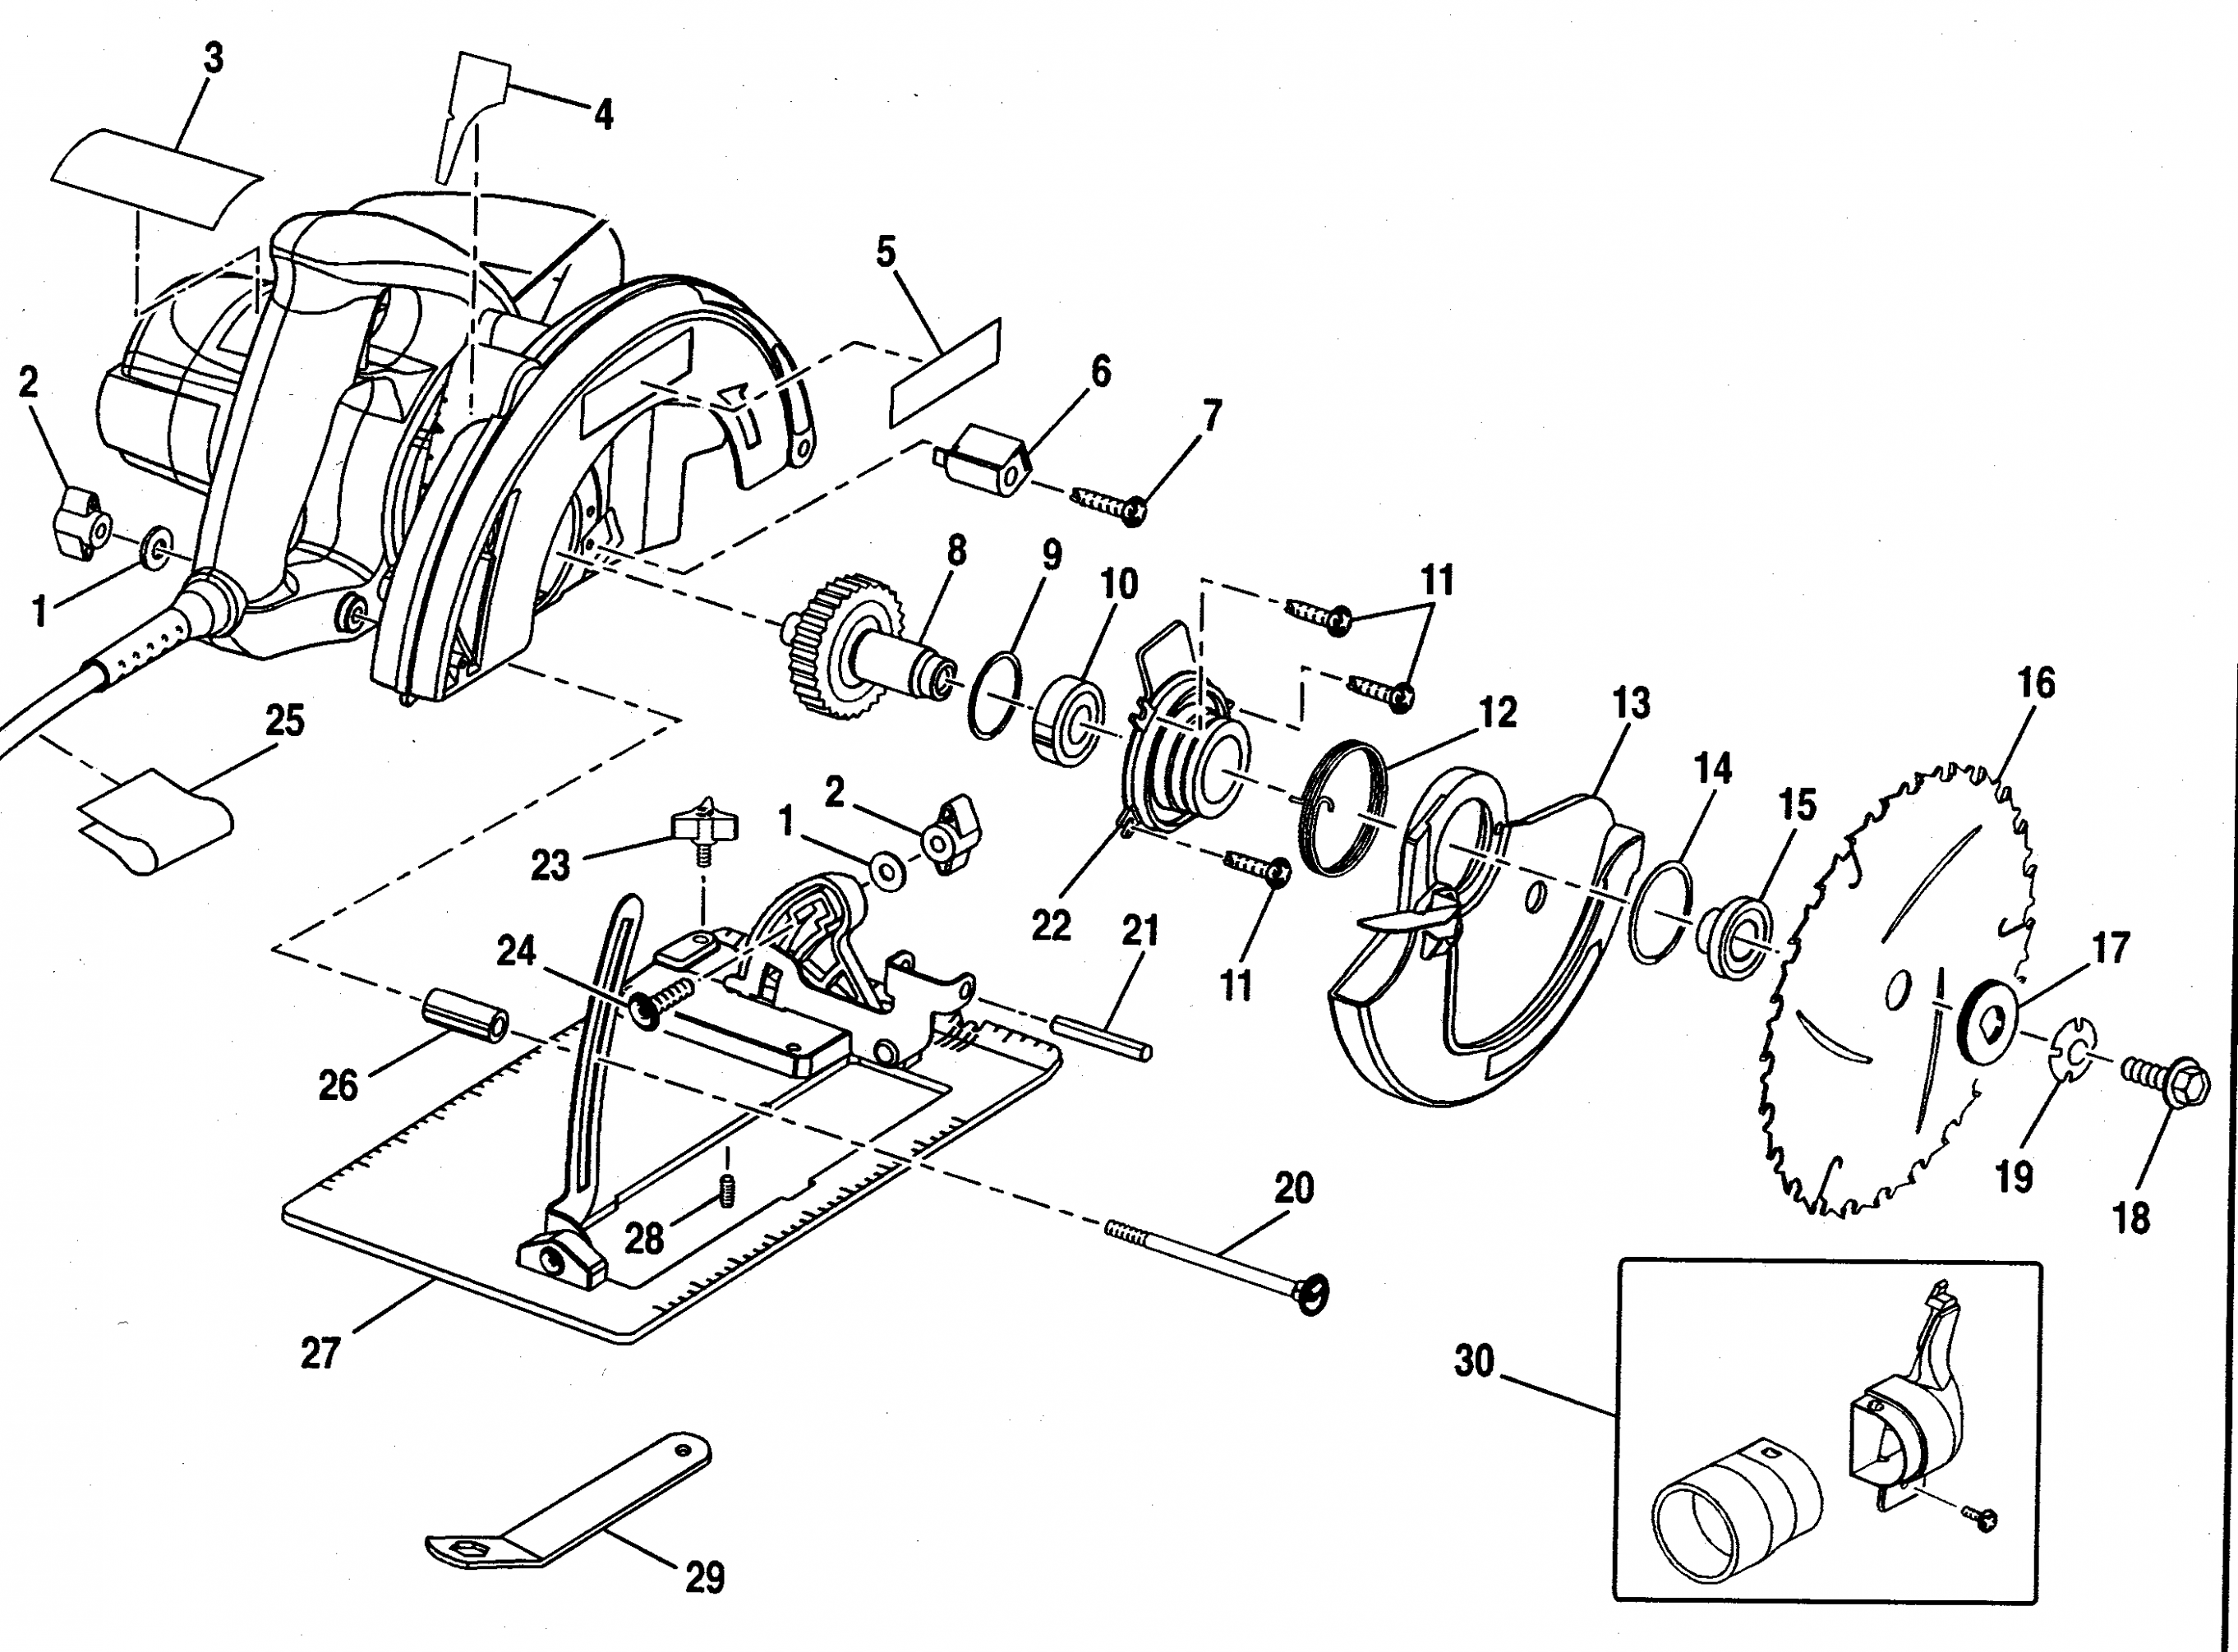 [DIAGRAM] Nissan Patrol Zd30 Engine Wiring Diagram FULL